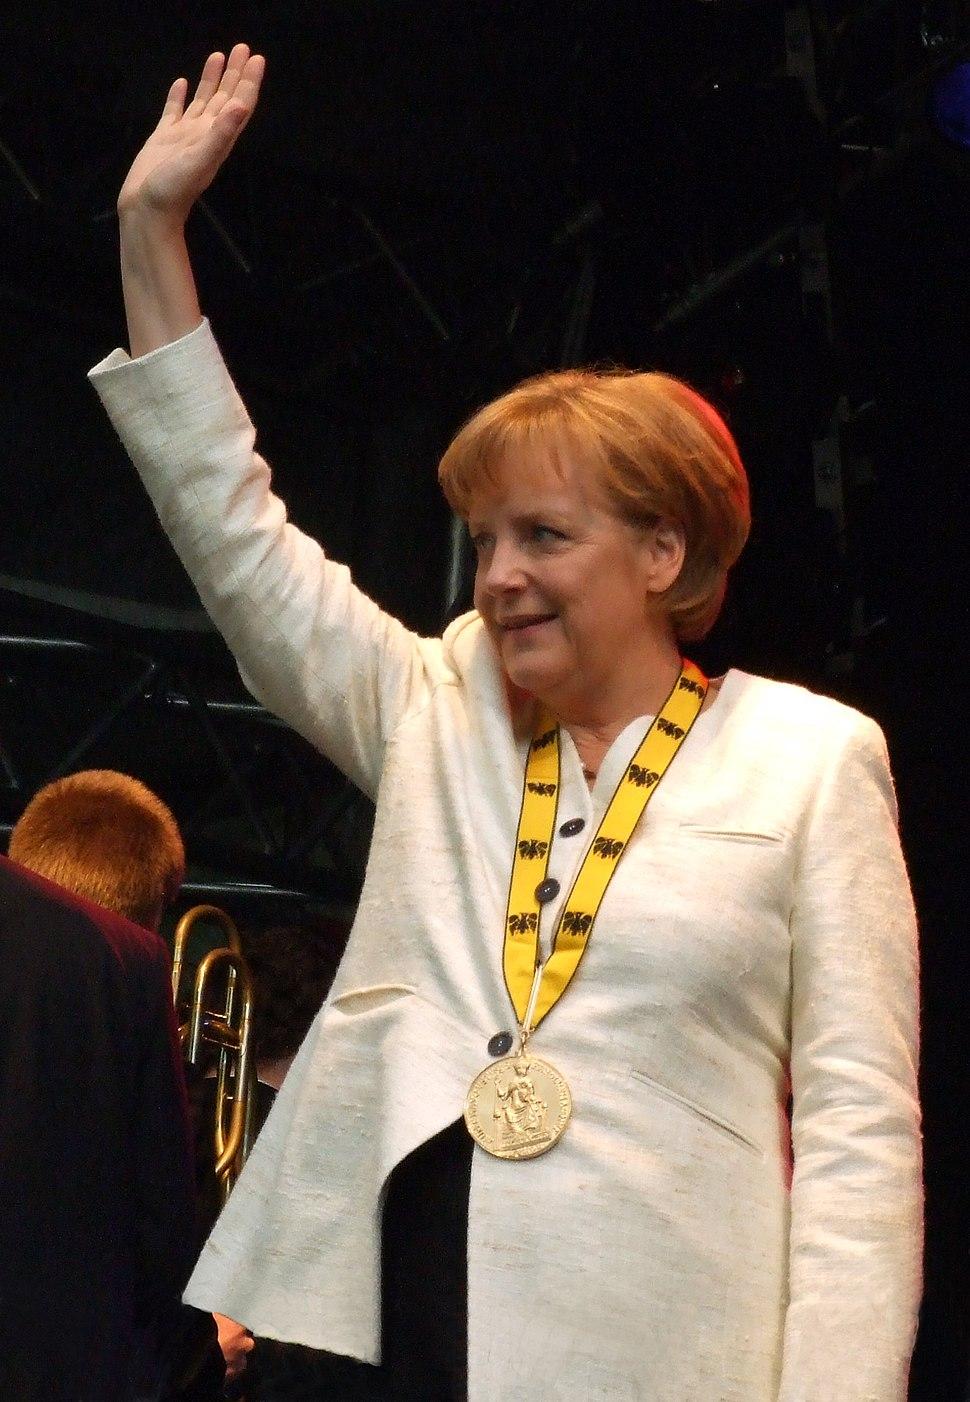 Angela Merkel, Karlspreisverleihung 2008 - 1